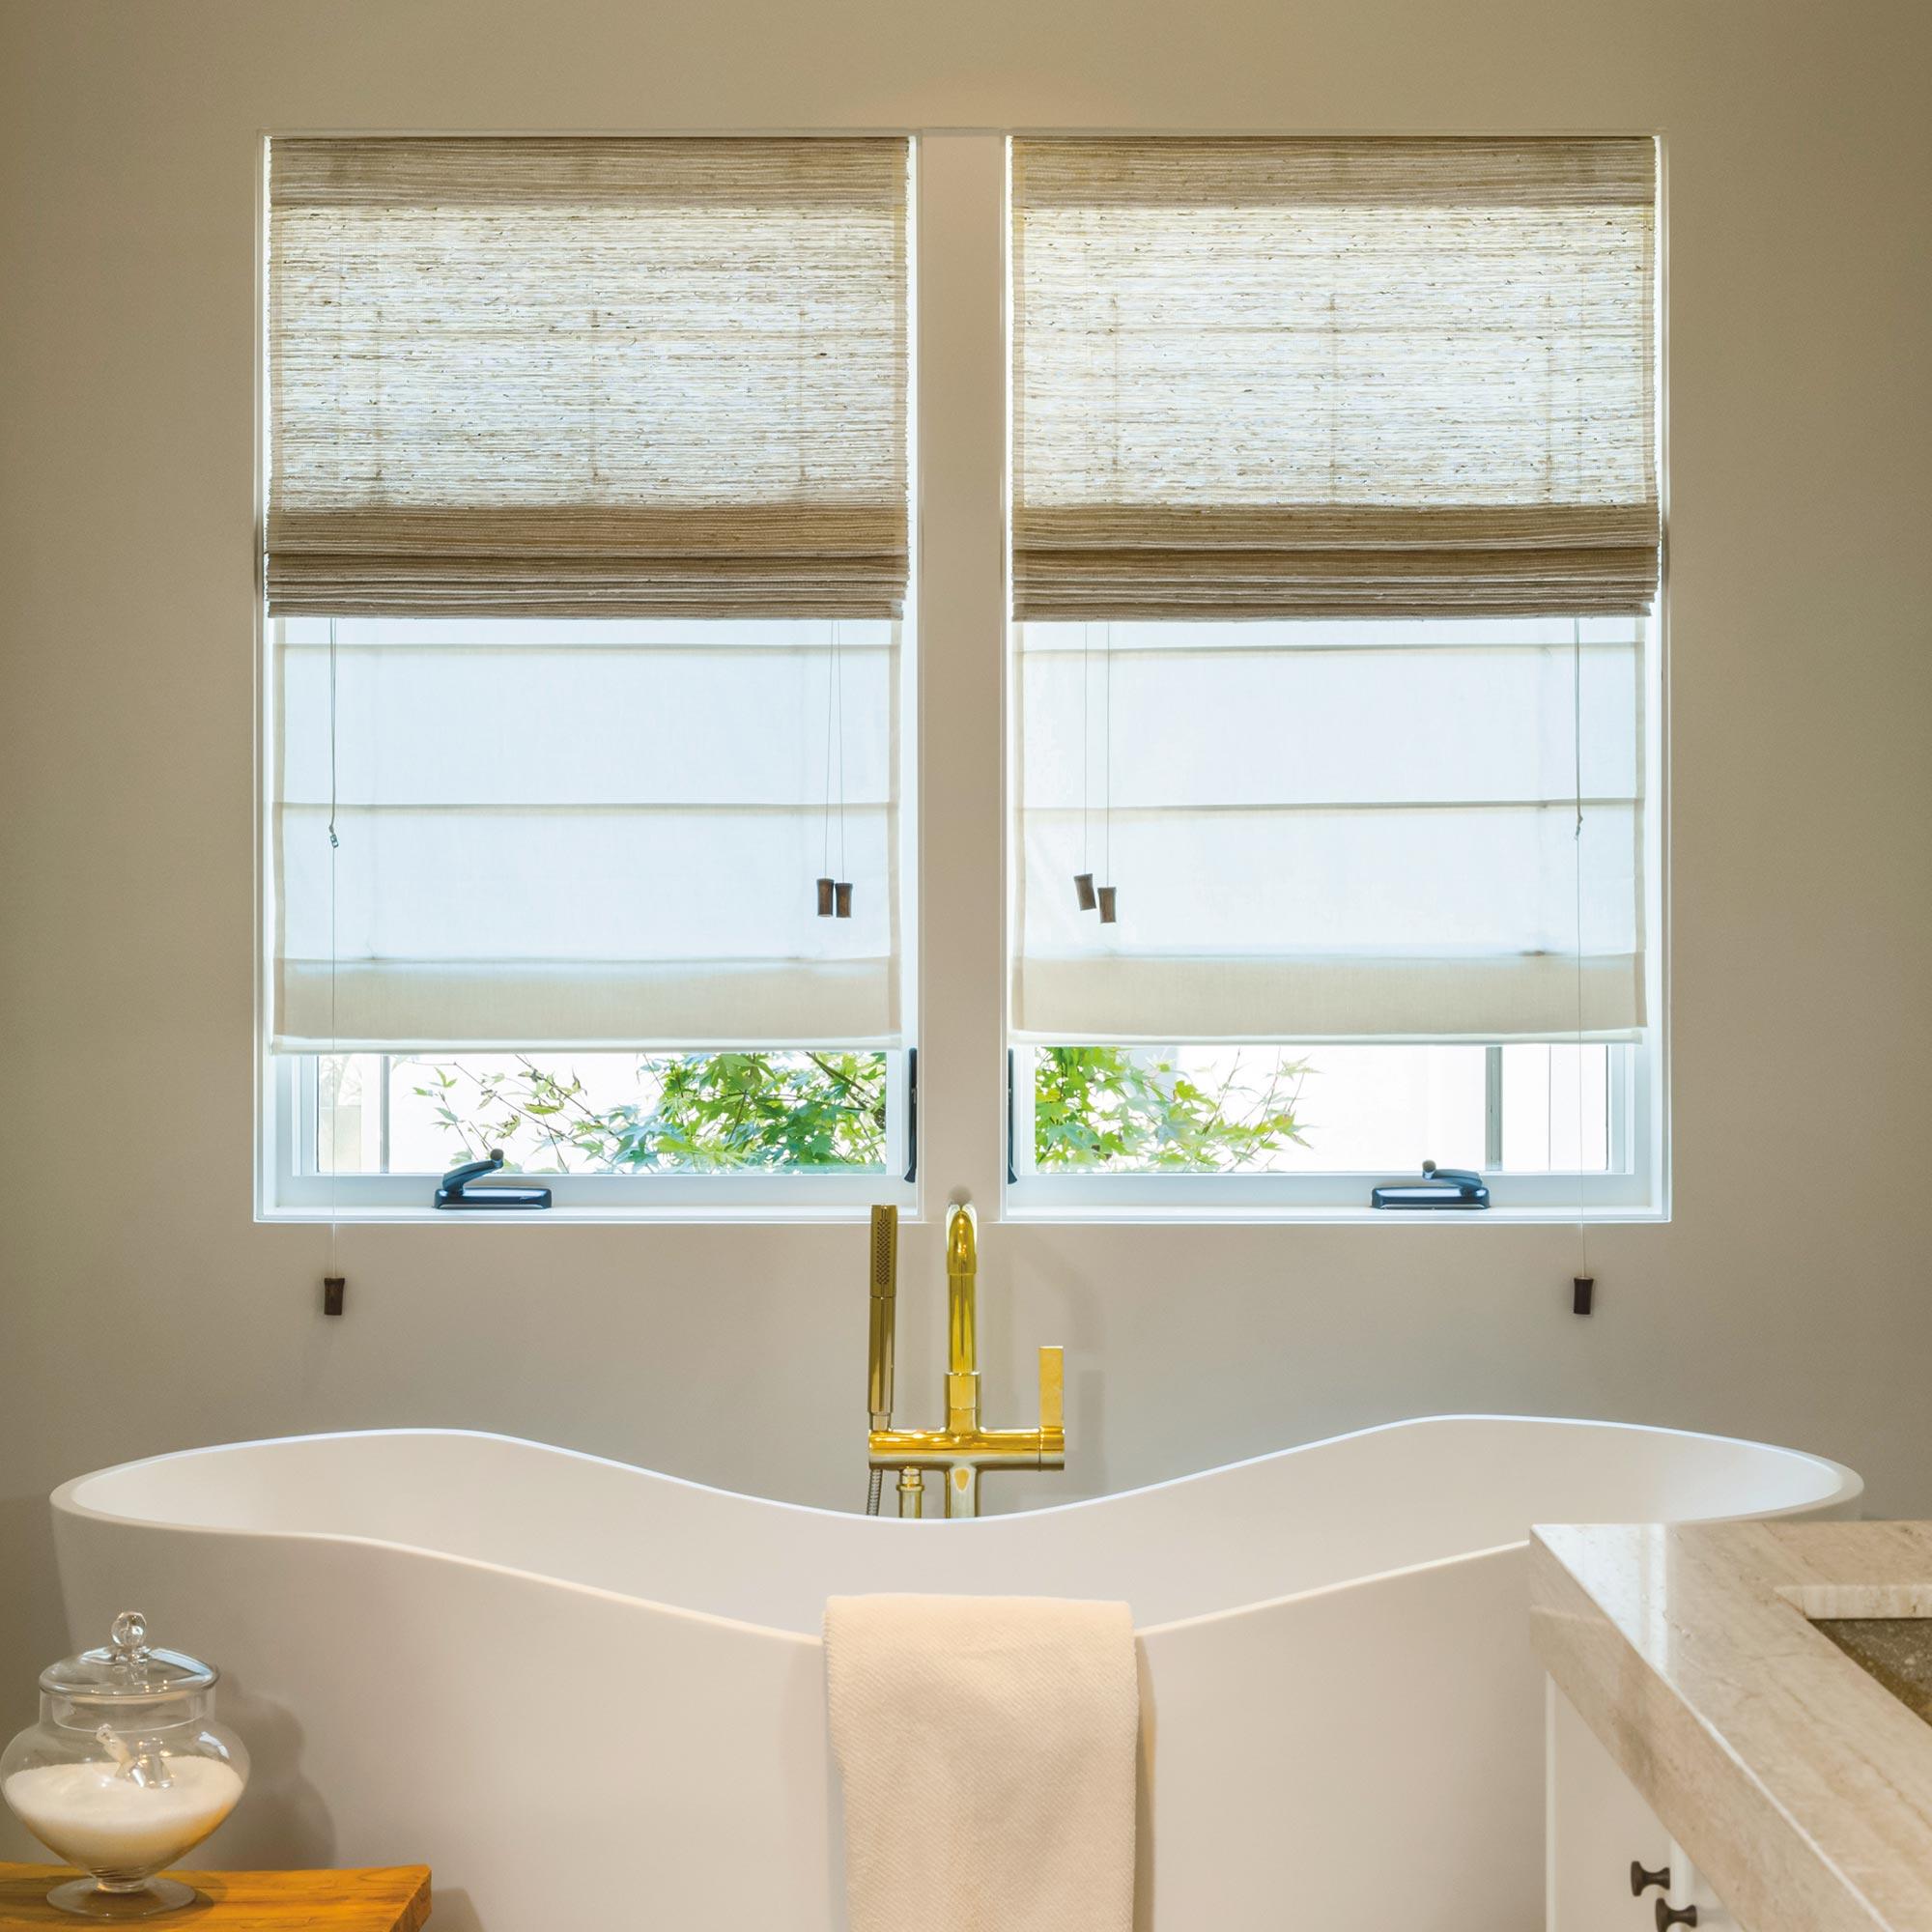 bathroom window ideas for privacy